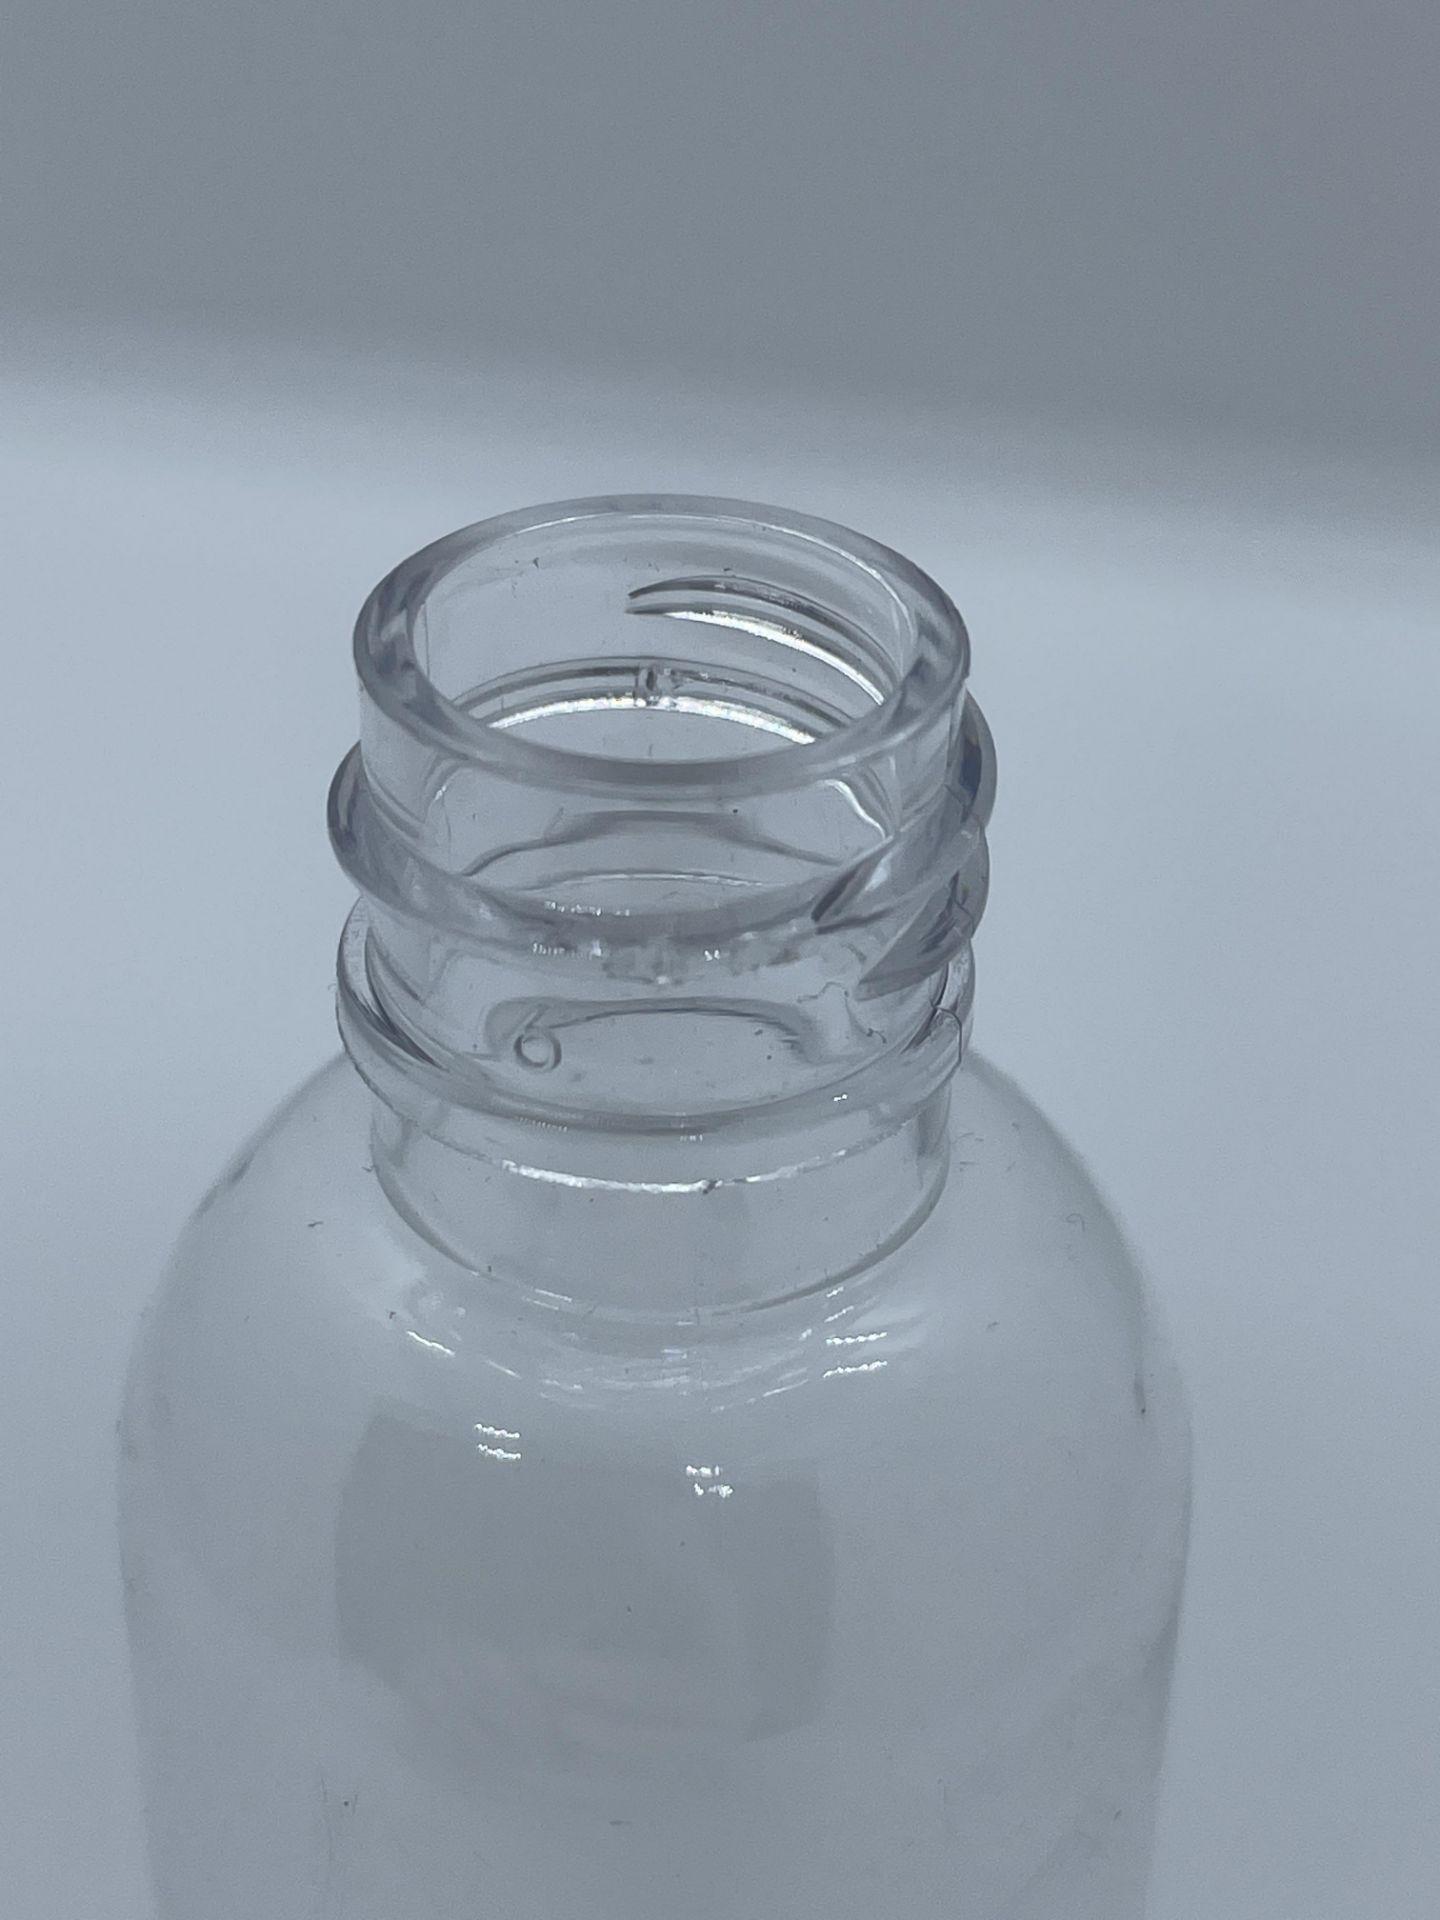 "99,500 - Clear Plastic Bullet 2 oz Empty Bottles, 18-410 Threading Neck, 4.25"" Tall 1.25"" Diameter - Image 4 of 5"